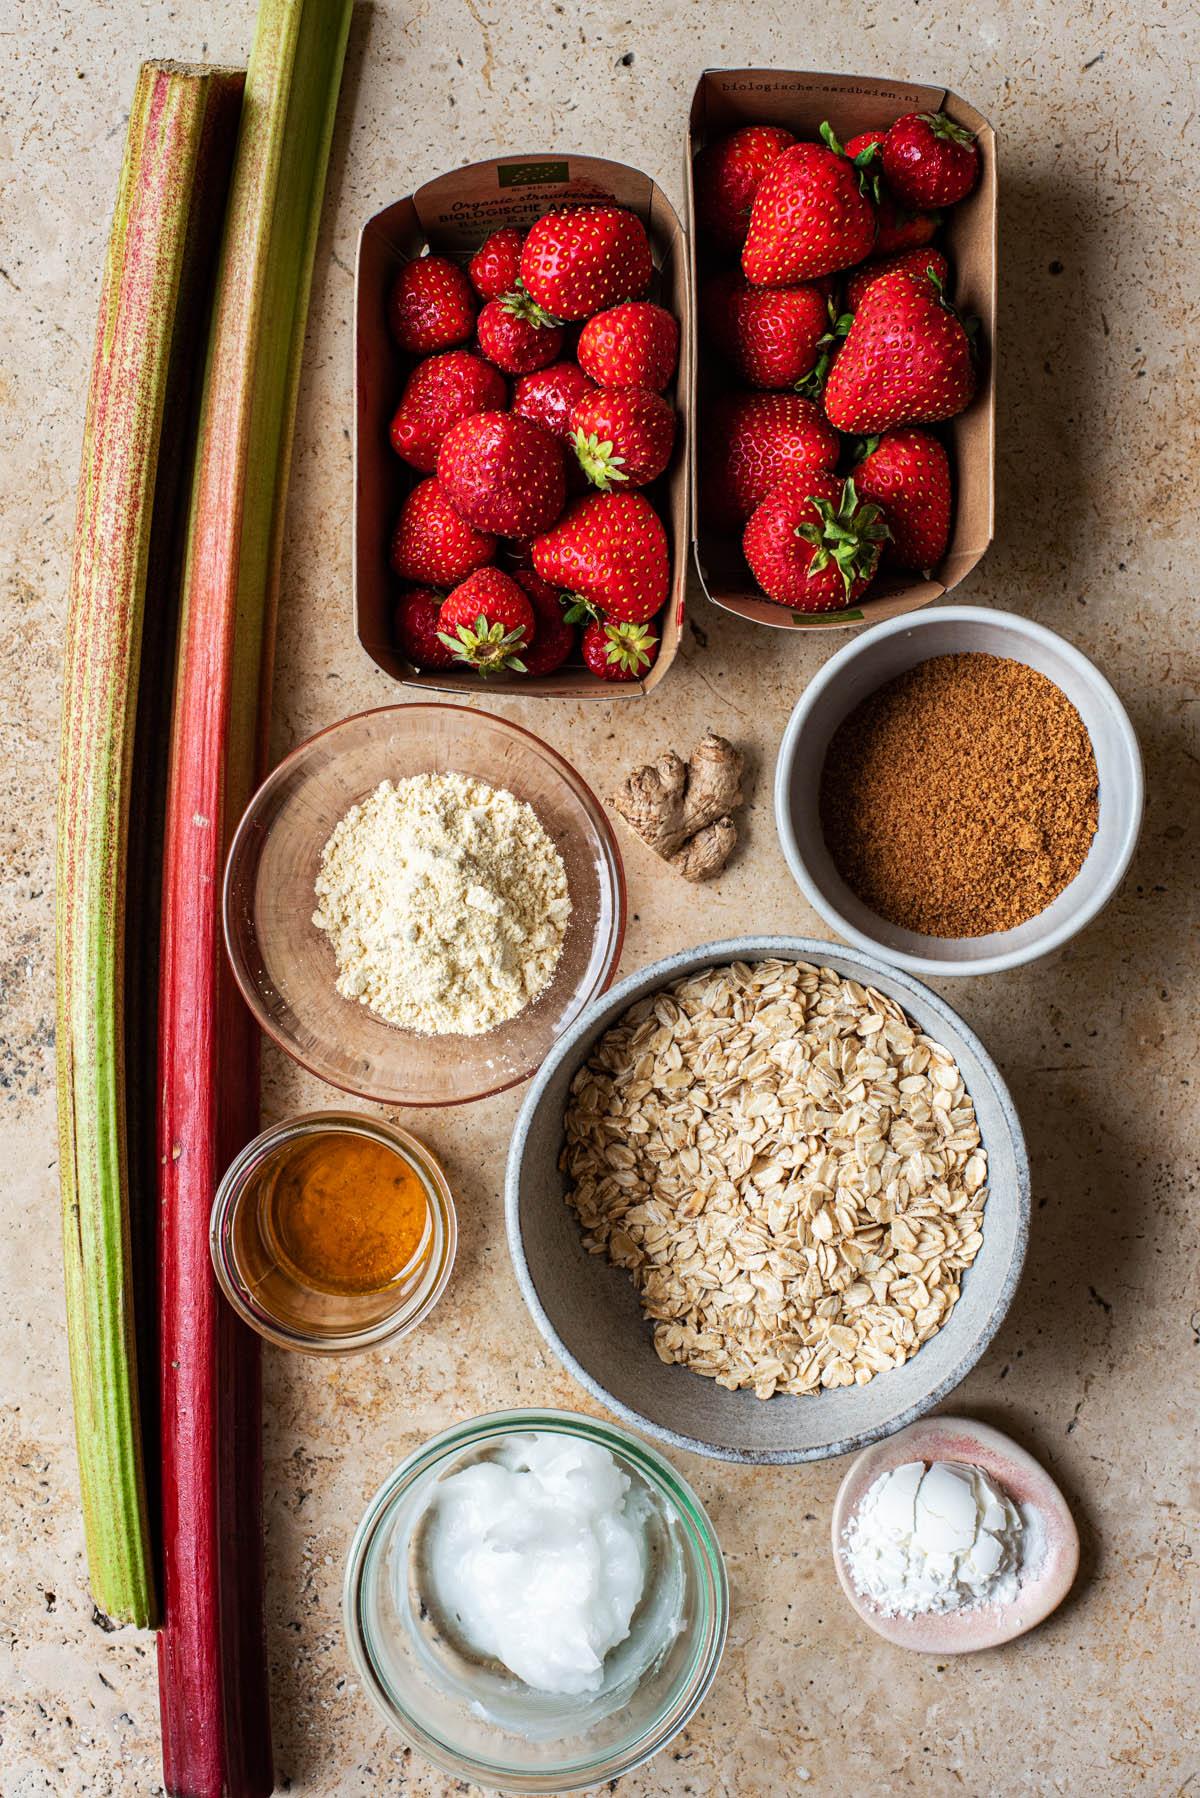 Strawberry rhubarb crisp ingredients.